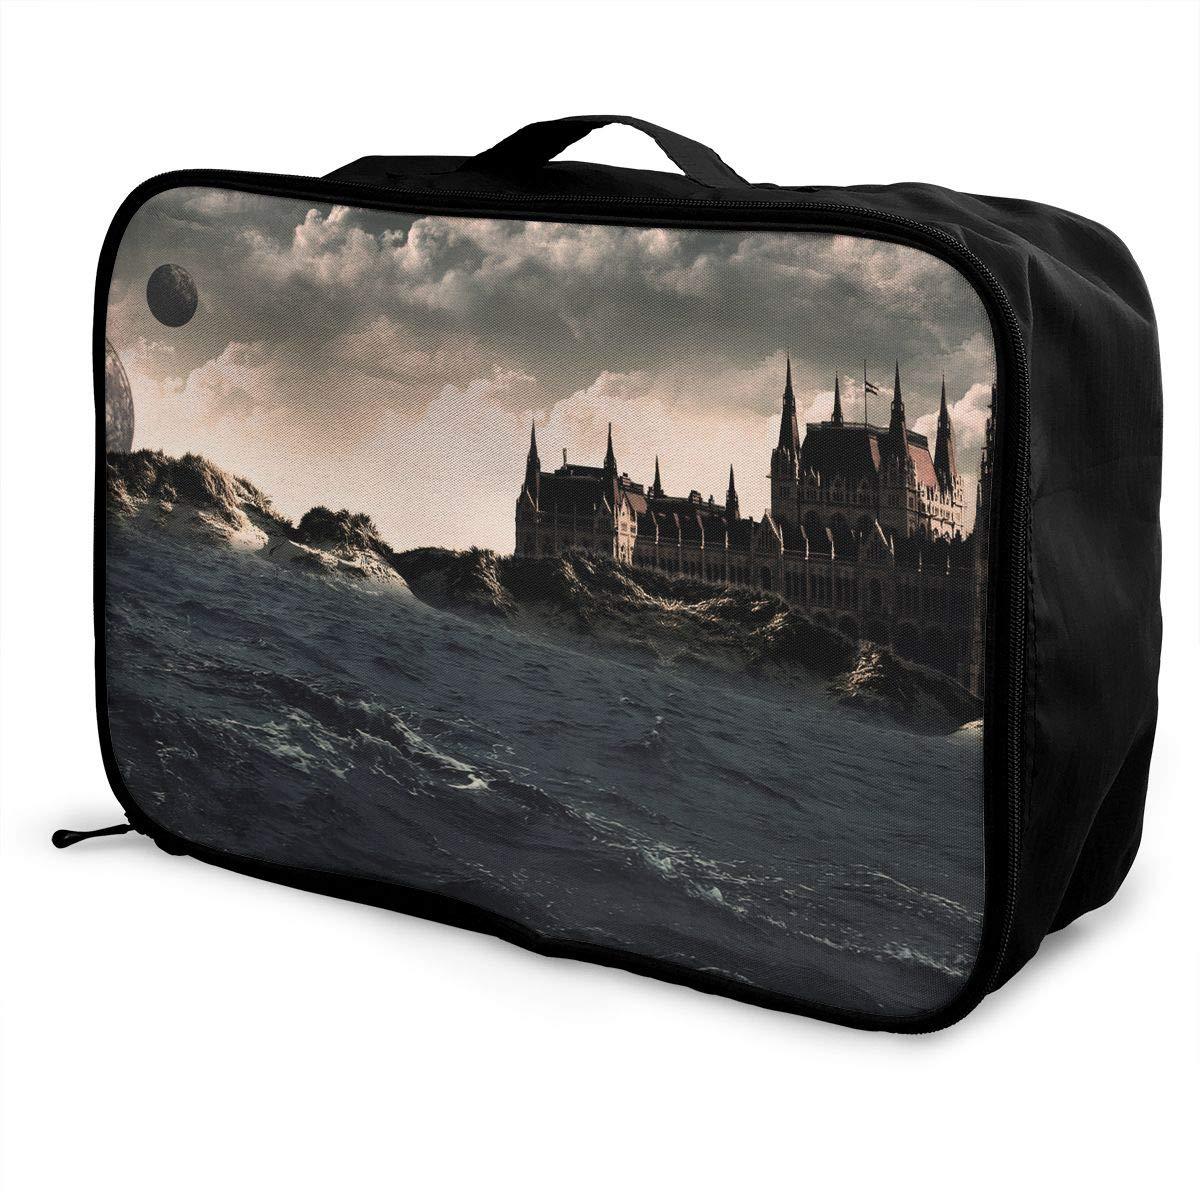 Travel Luggage Duffle Bag Lightweight Portable Handbag Surreal World Water Pattern Large Capacity Waterproof Foldable Storage Tote